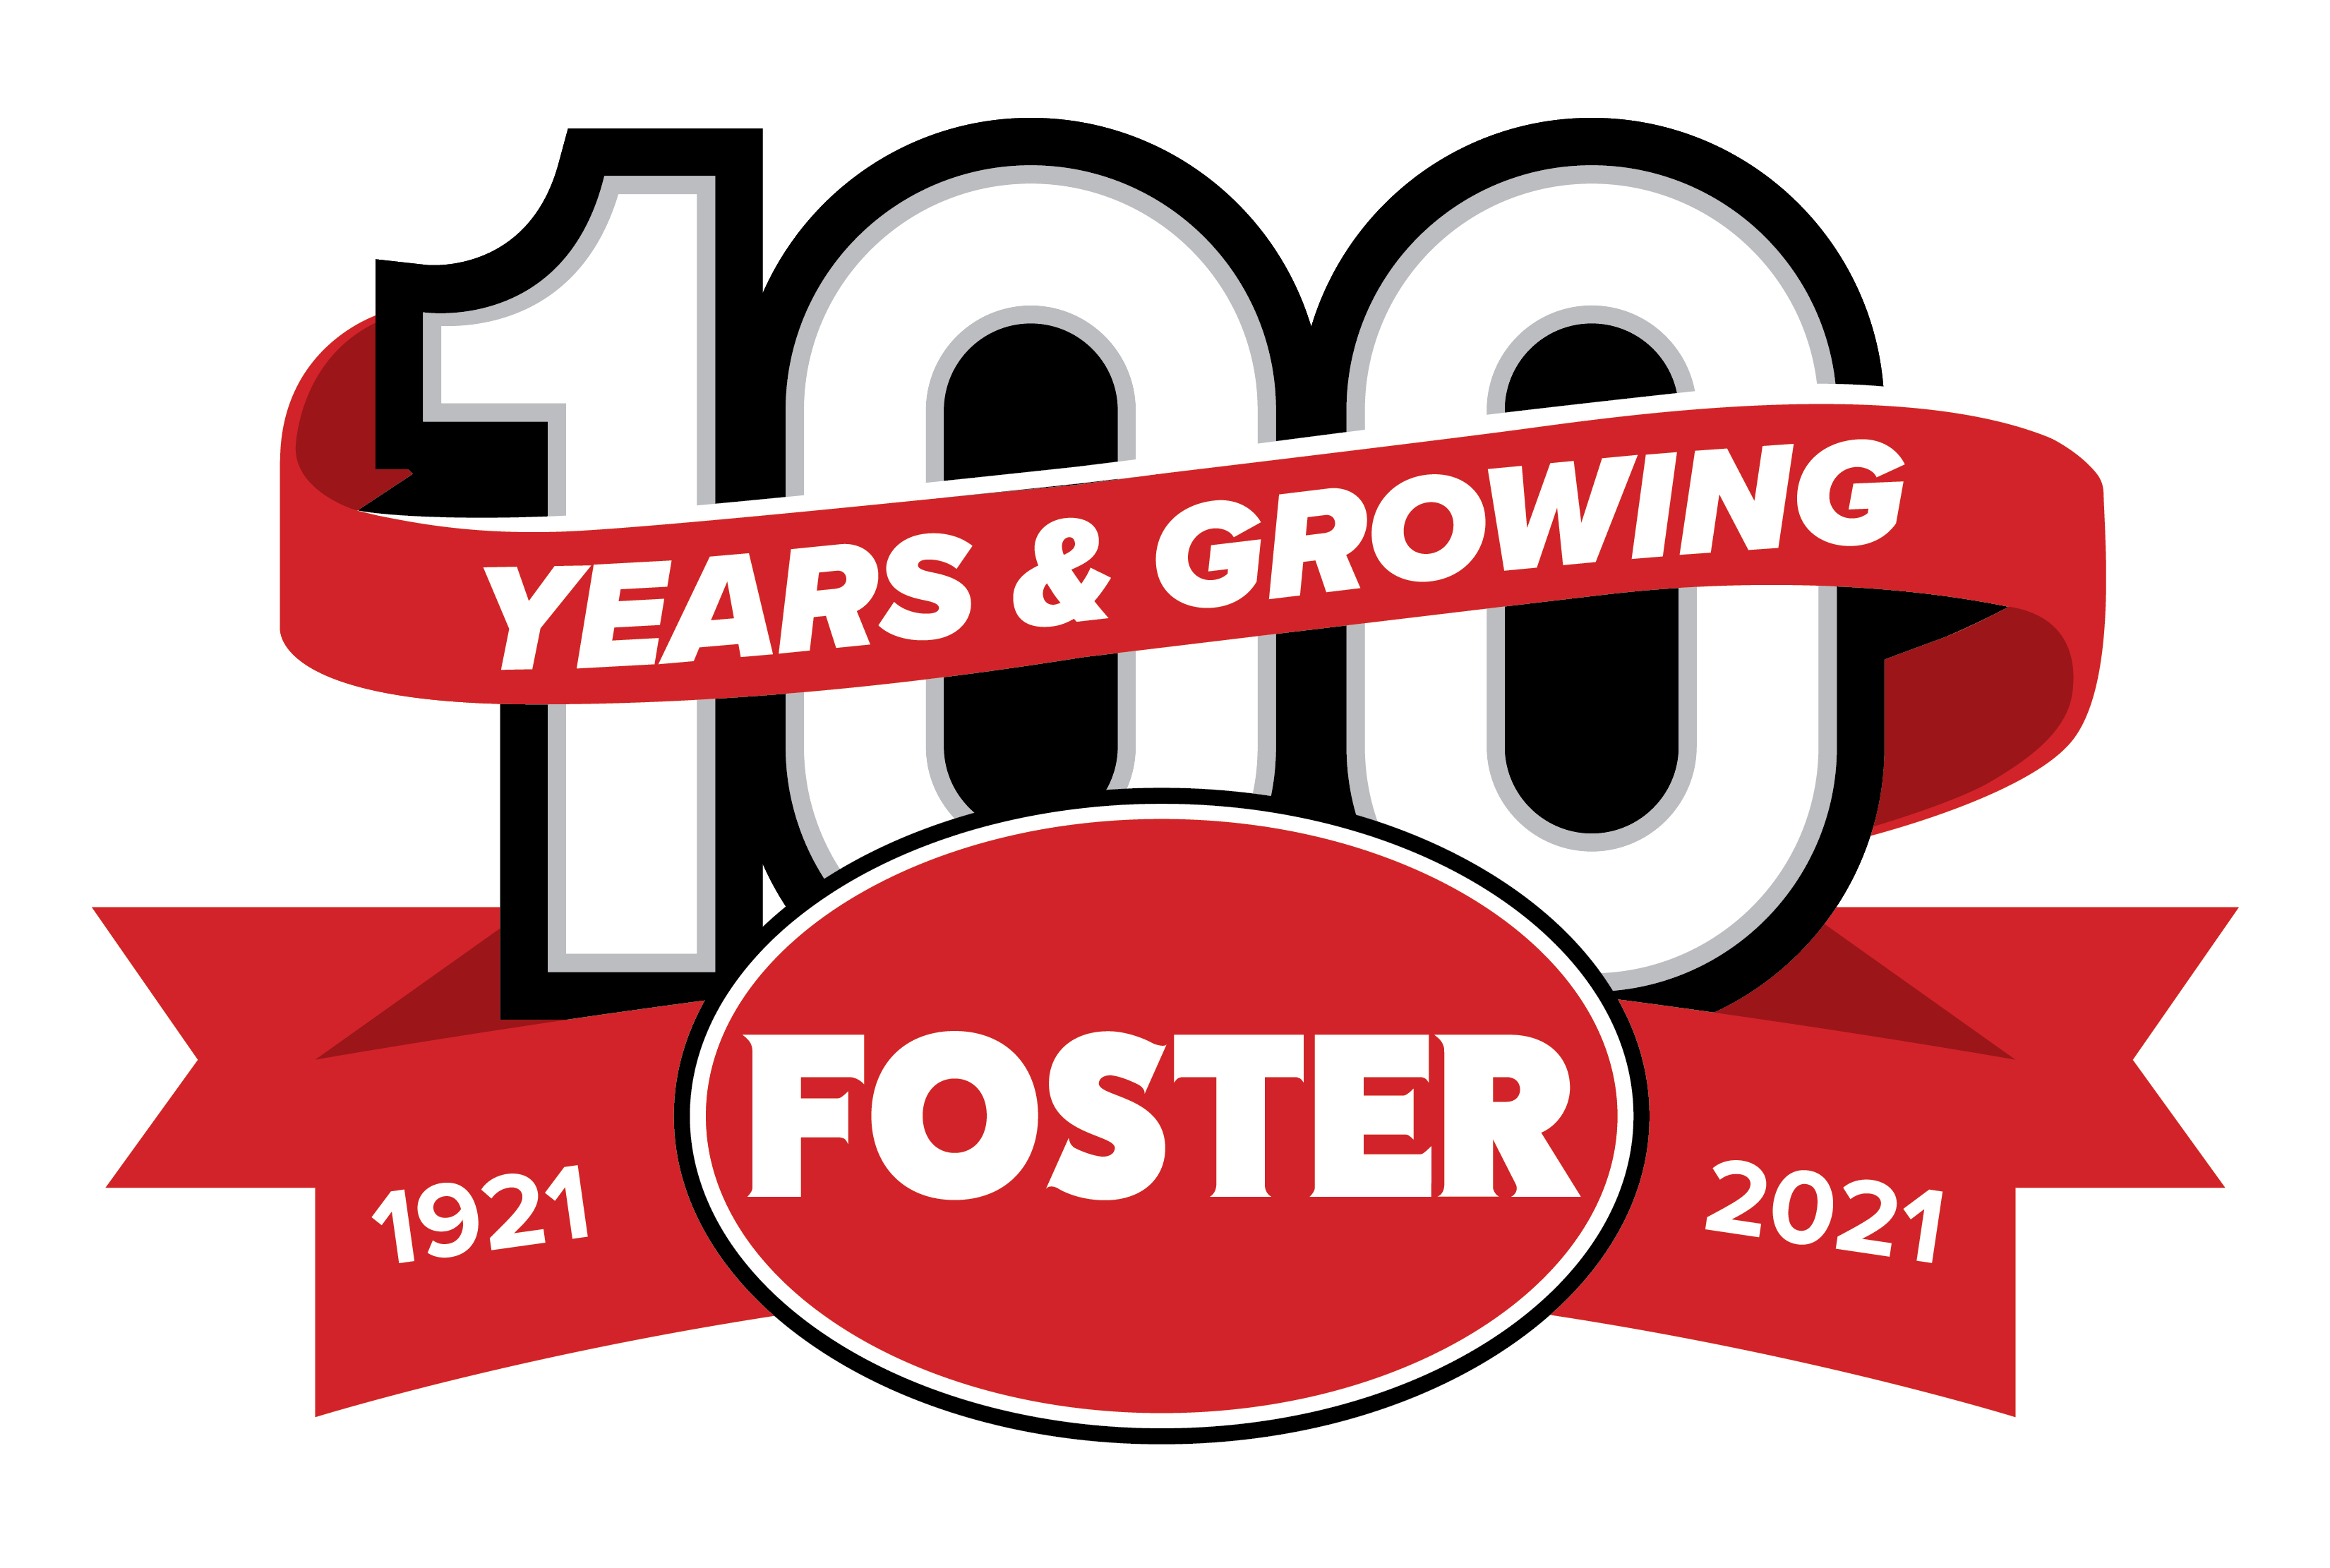 https://growthzonesitesprod.azureedge.net/wp-content/uploads/sites/668/2021/03/PNG_100_Foster-Fuels_logo_PNG.png